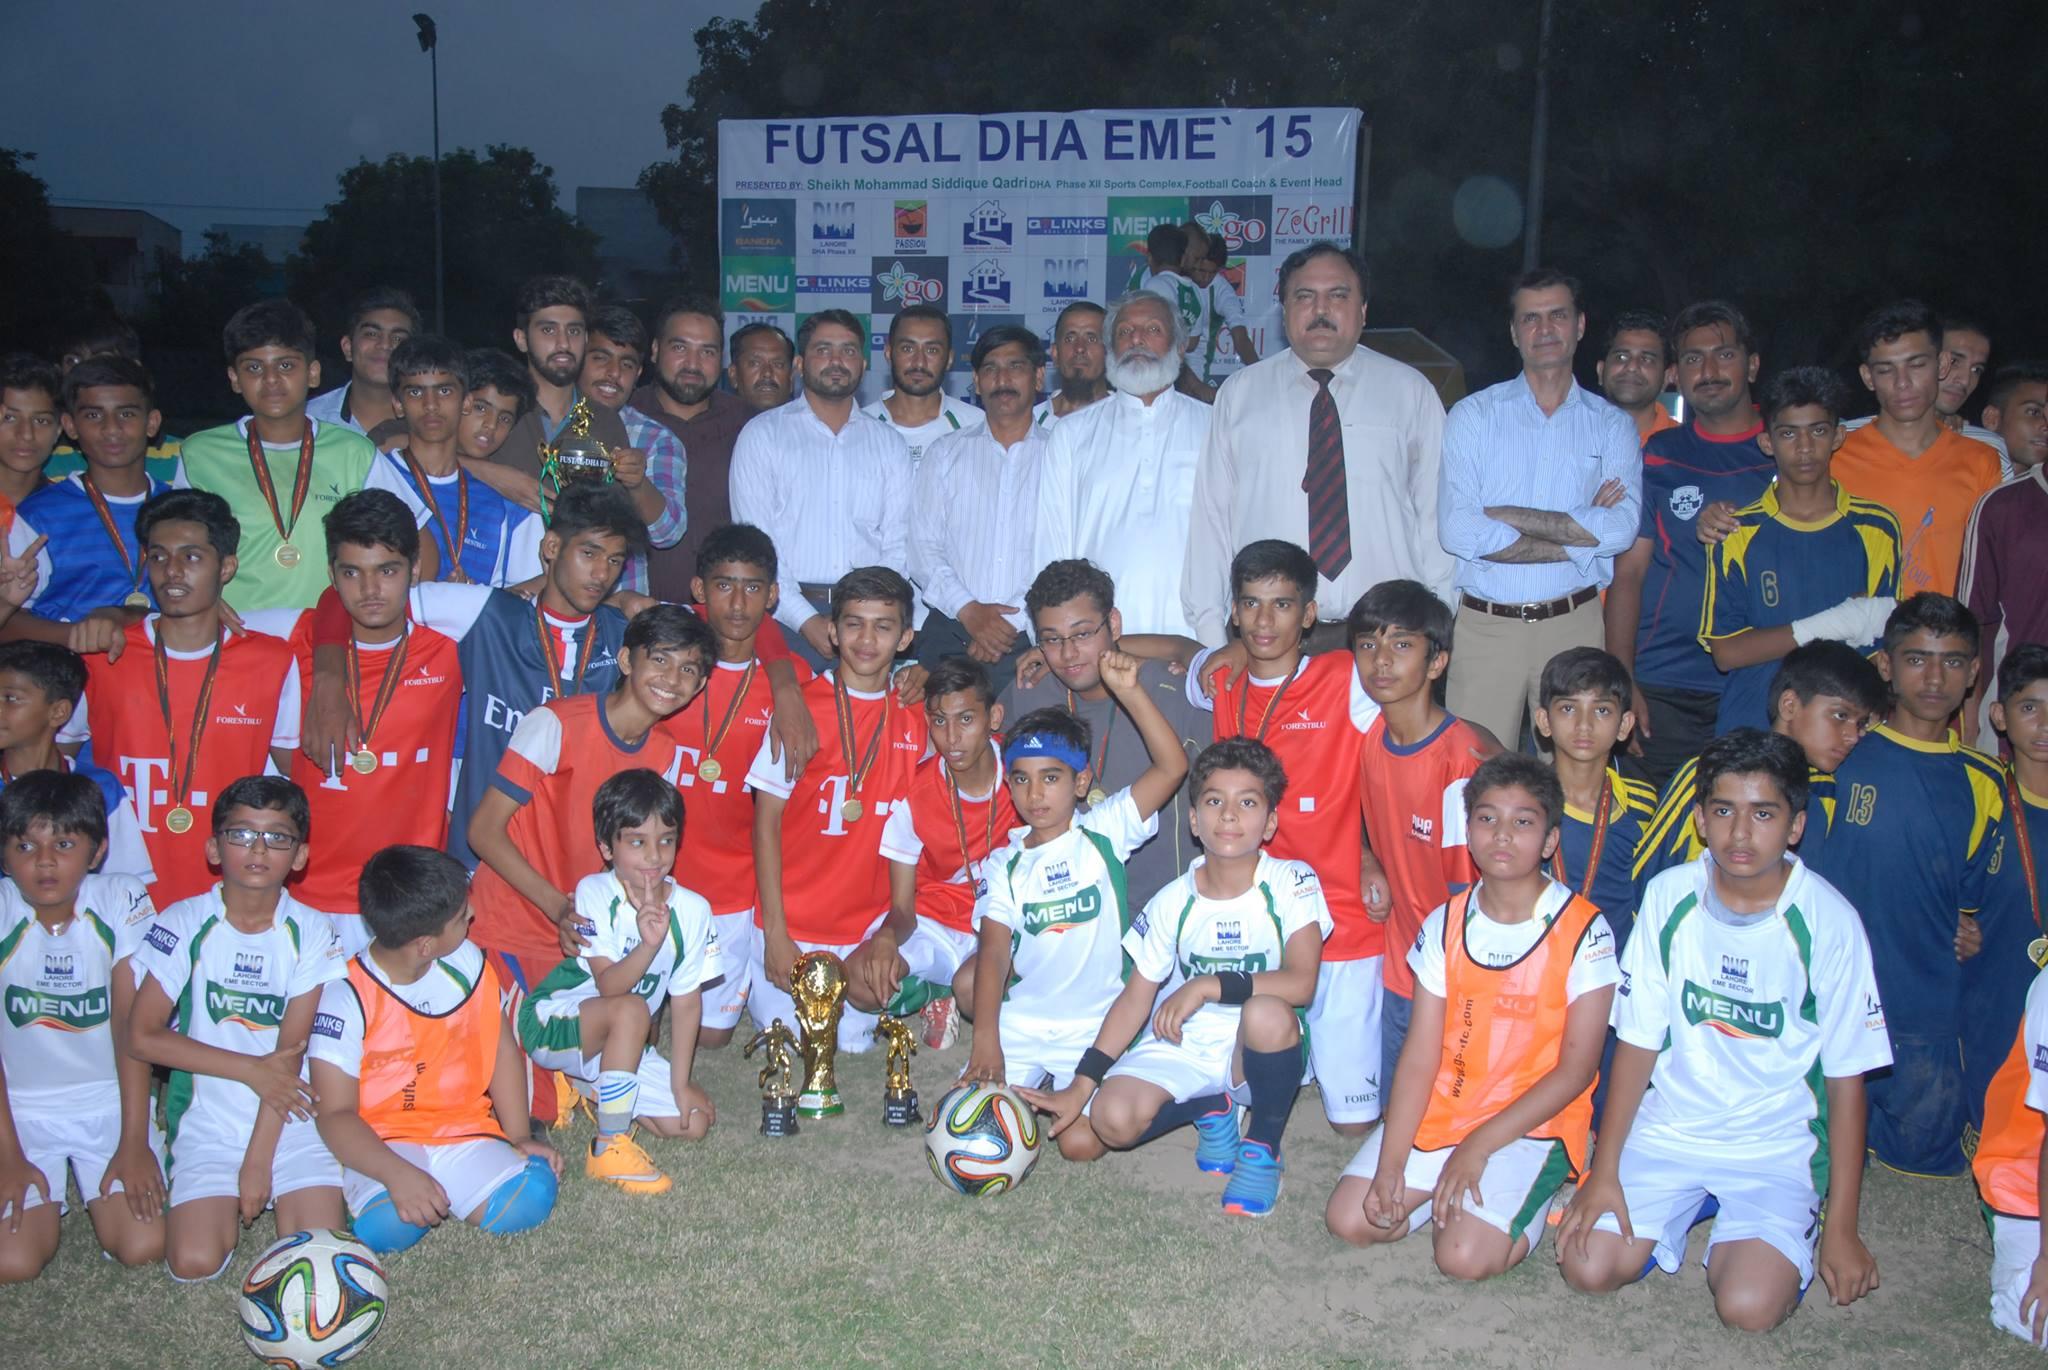 Dha Eme Futsal 2015 Final Match and Prize distribution